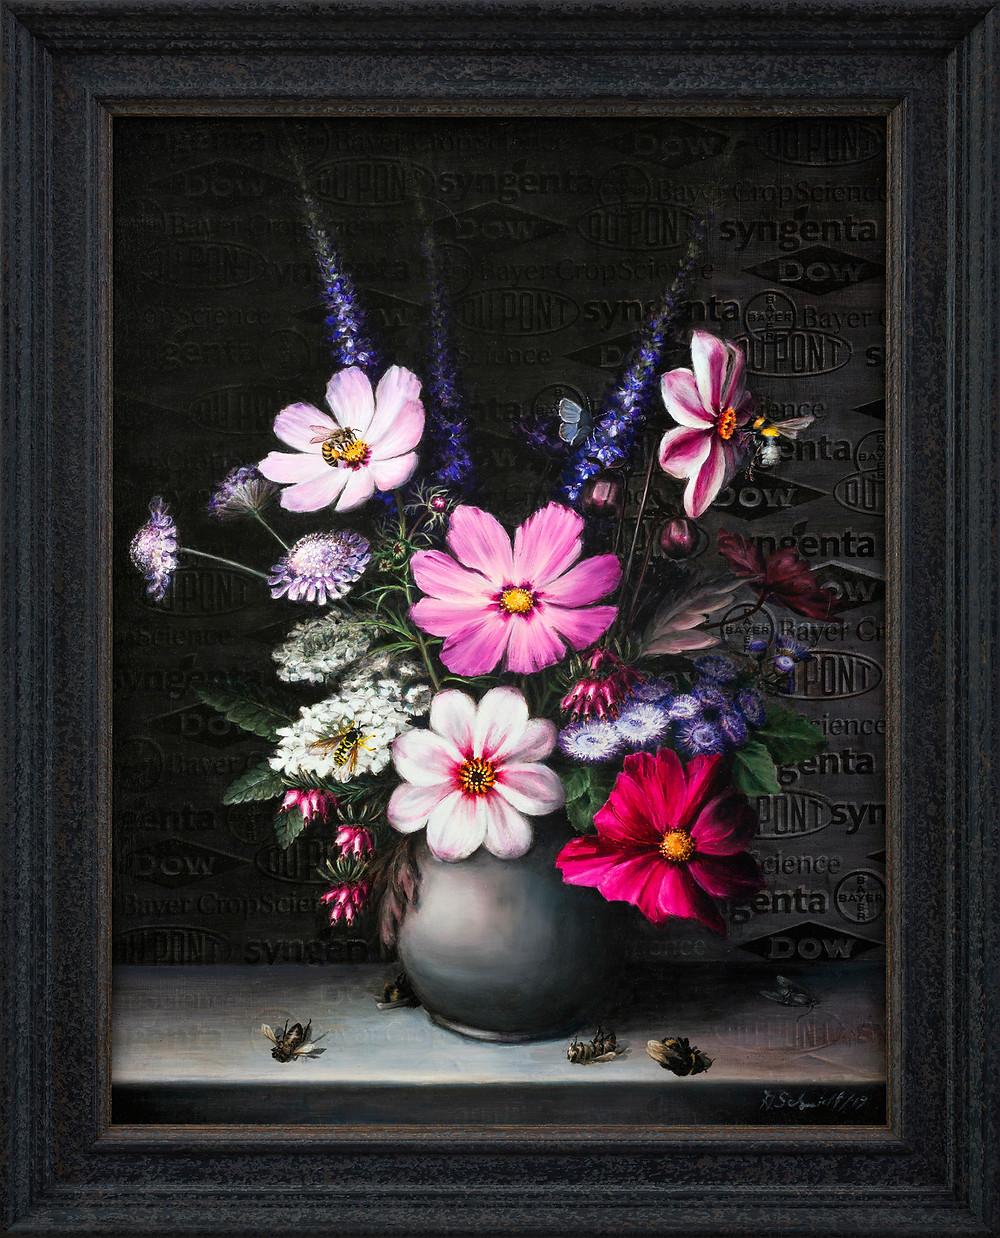 Alke Schmidt, Treacherous Flowers (2019)